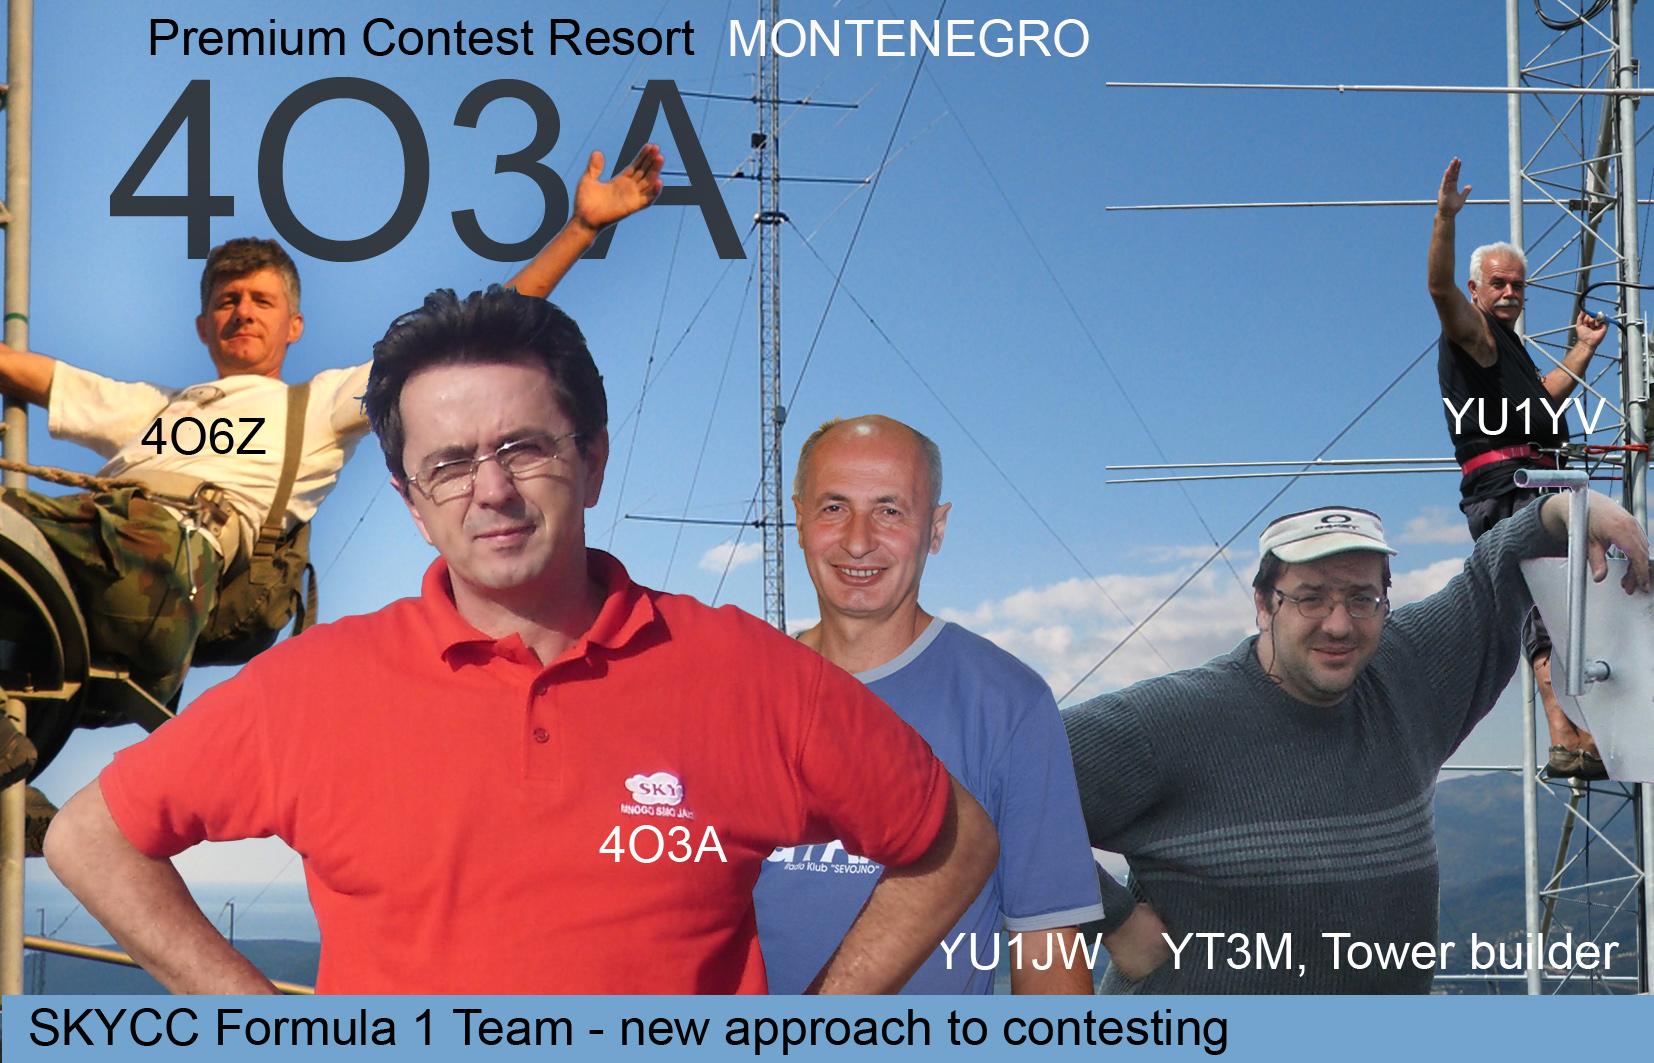 Черногория Sky Contest Club 4O3A